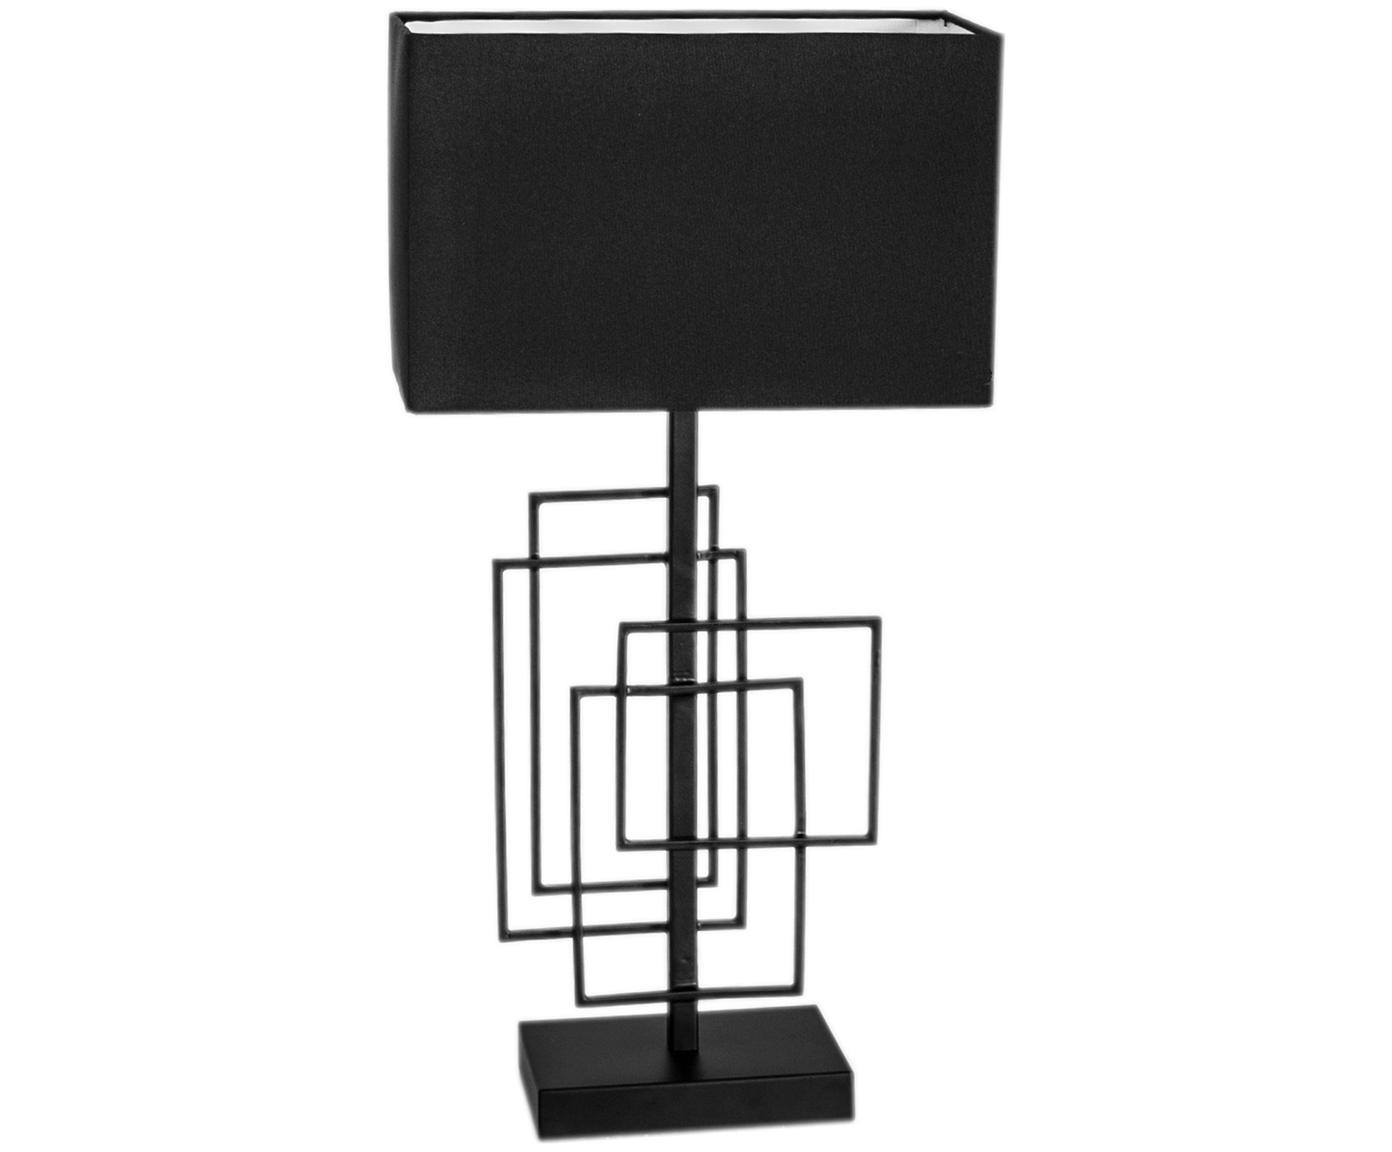 Lámpara de mesa de lino Paragon, Estructura: metal pintado en polvo, Pantalla: lino, Cable: plástico, Negro, An 27 x Al 52 cm